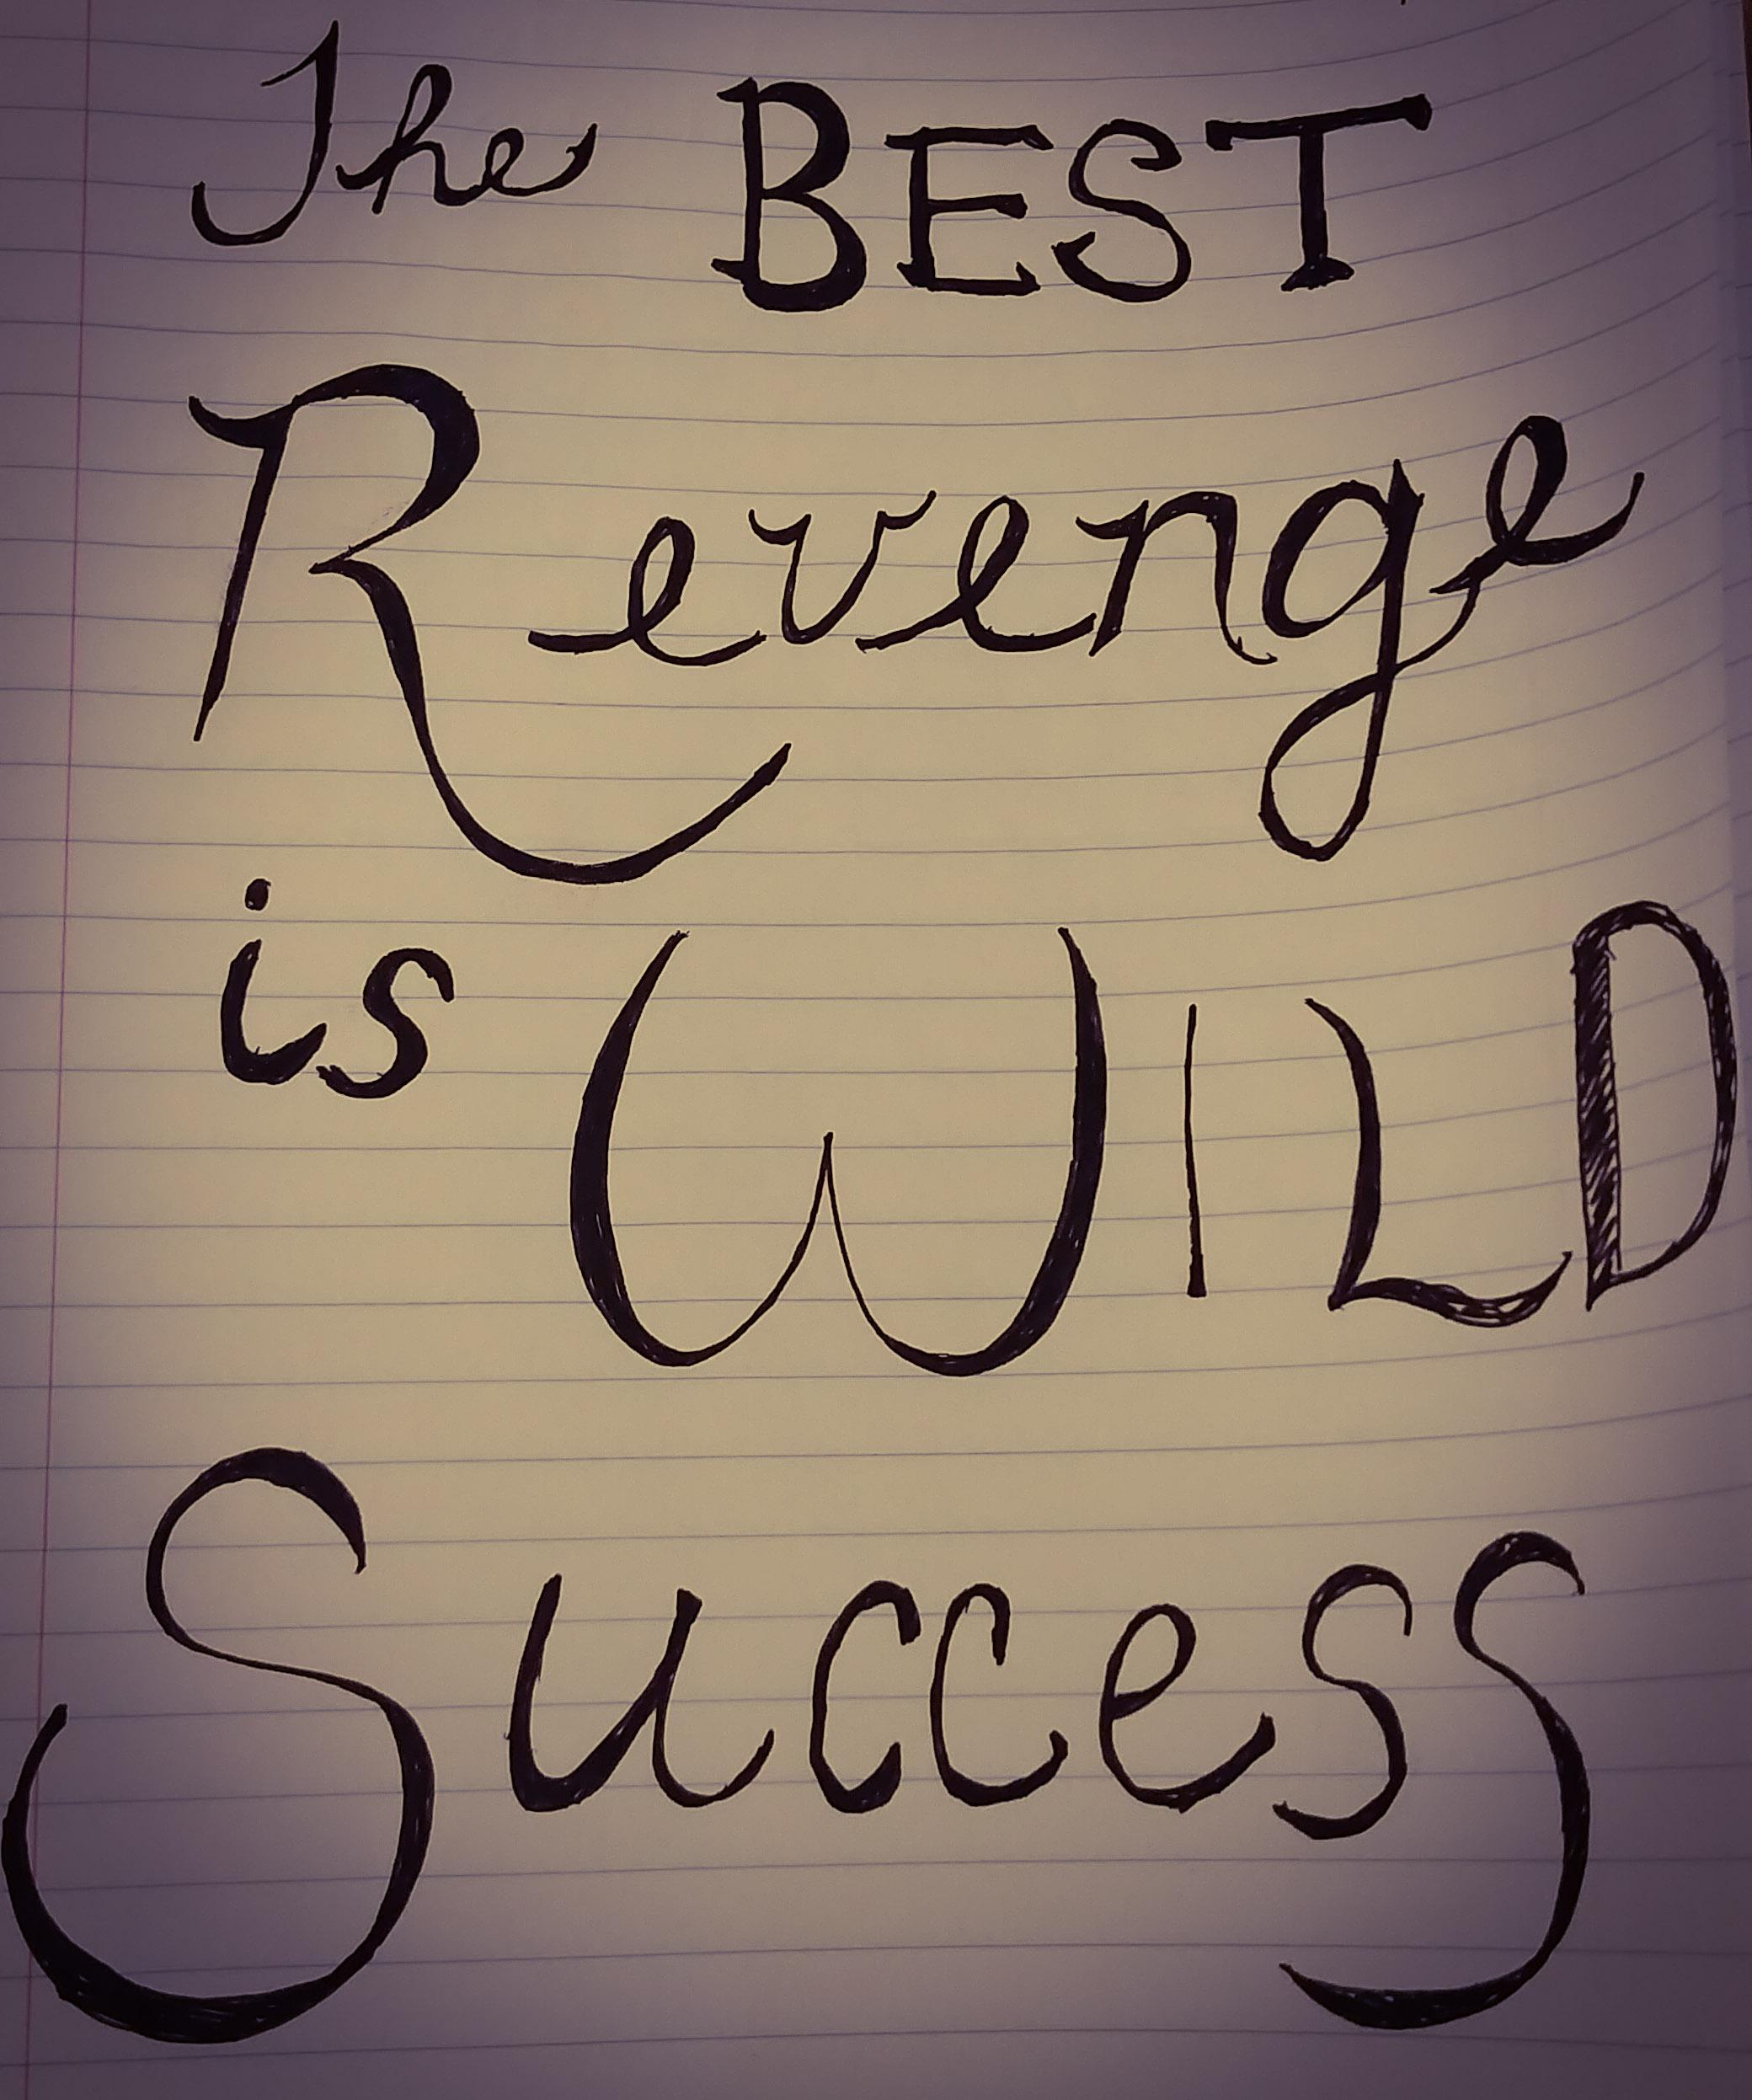 The best revenge is wild success